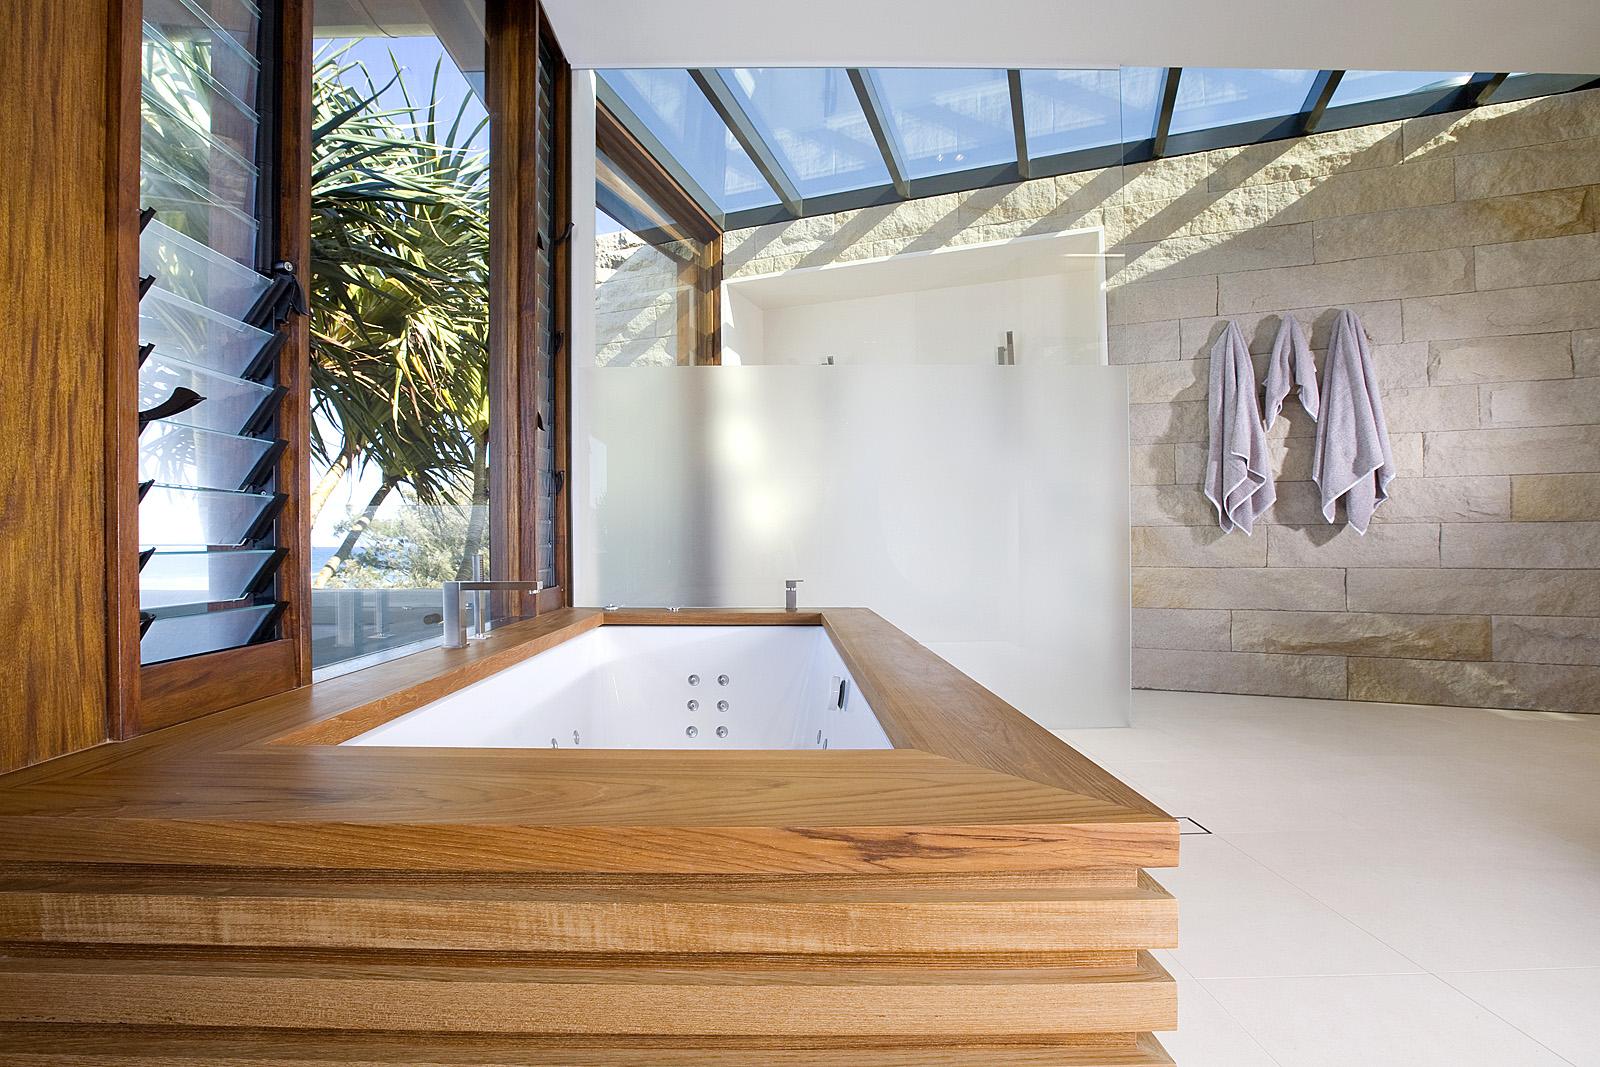 Albatross bathroom by BGD Architects